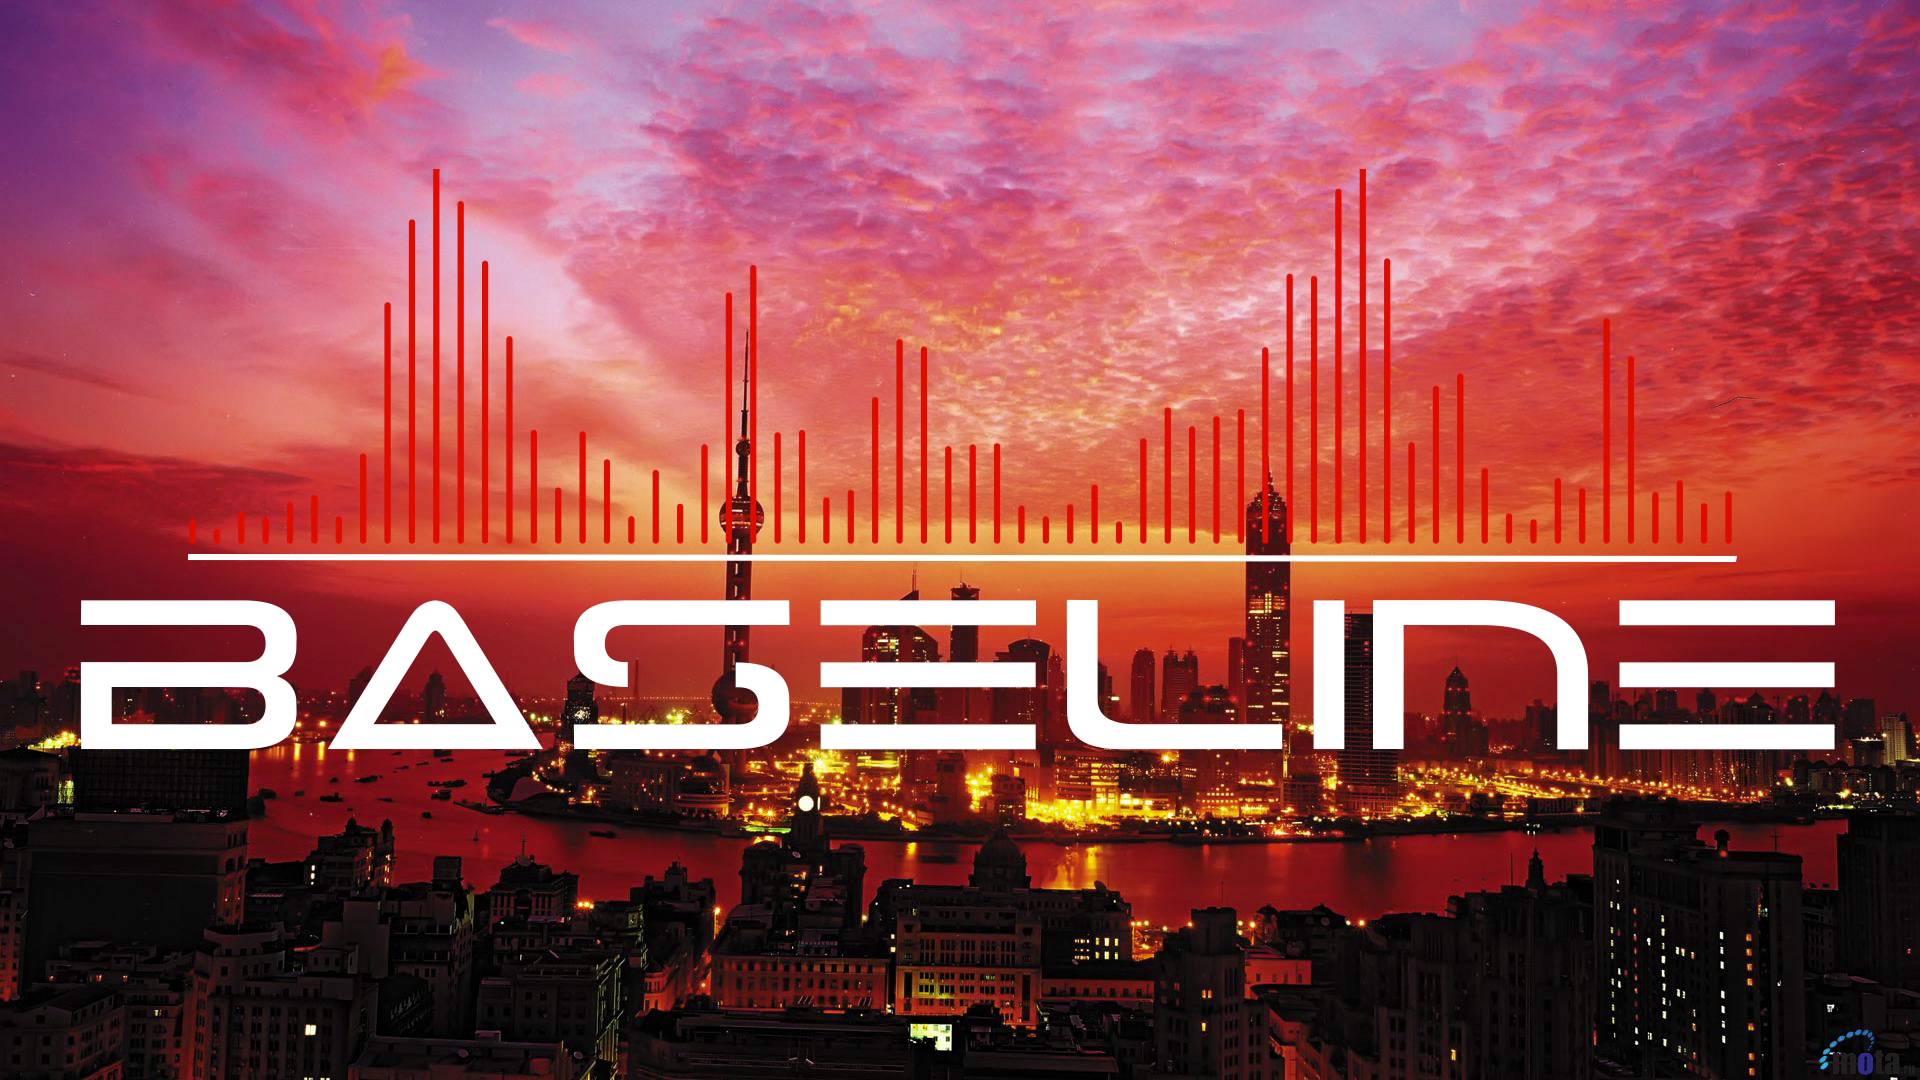 Oasis - Wonderwall (Mokhov Electronic Remix)